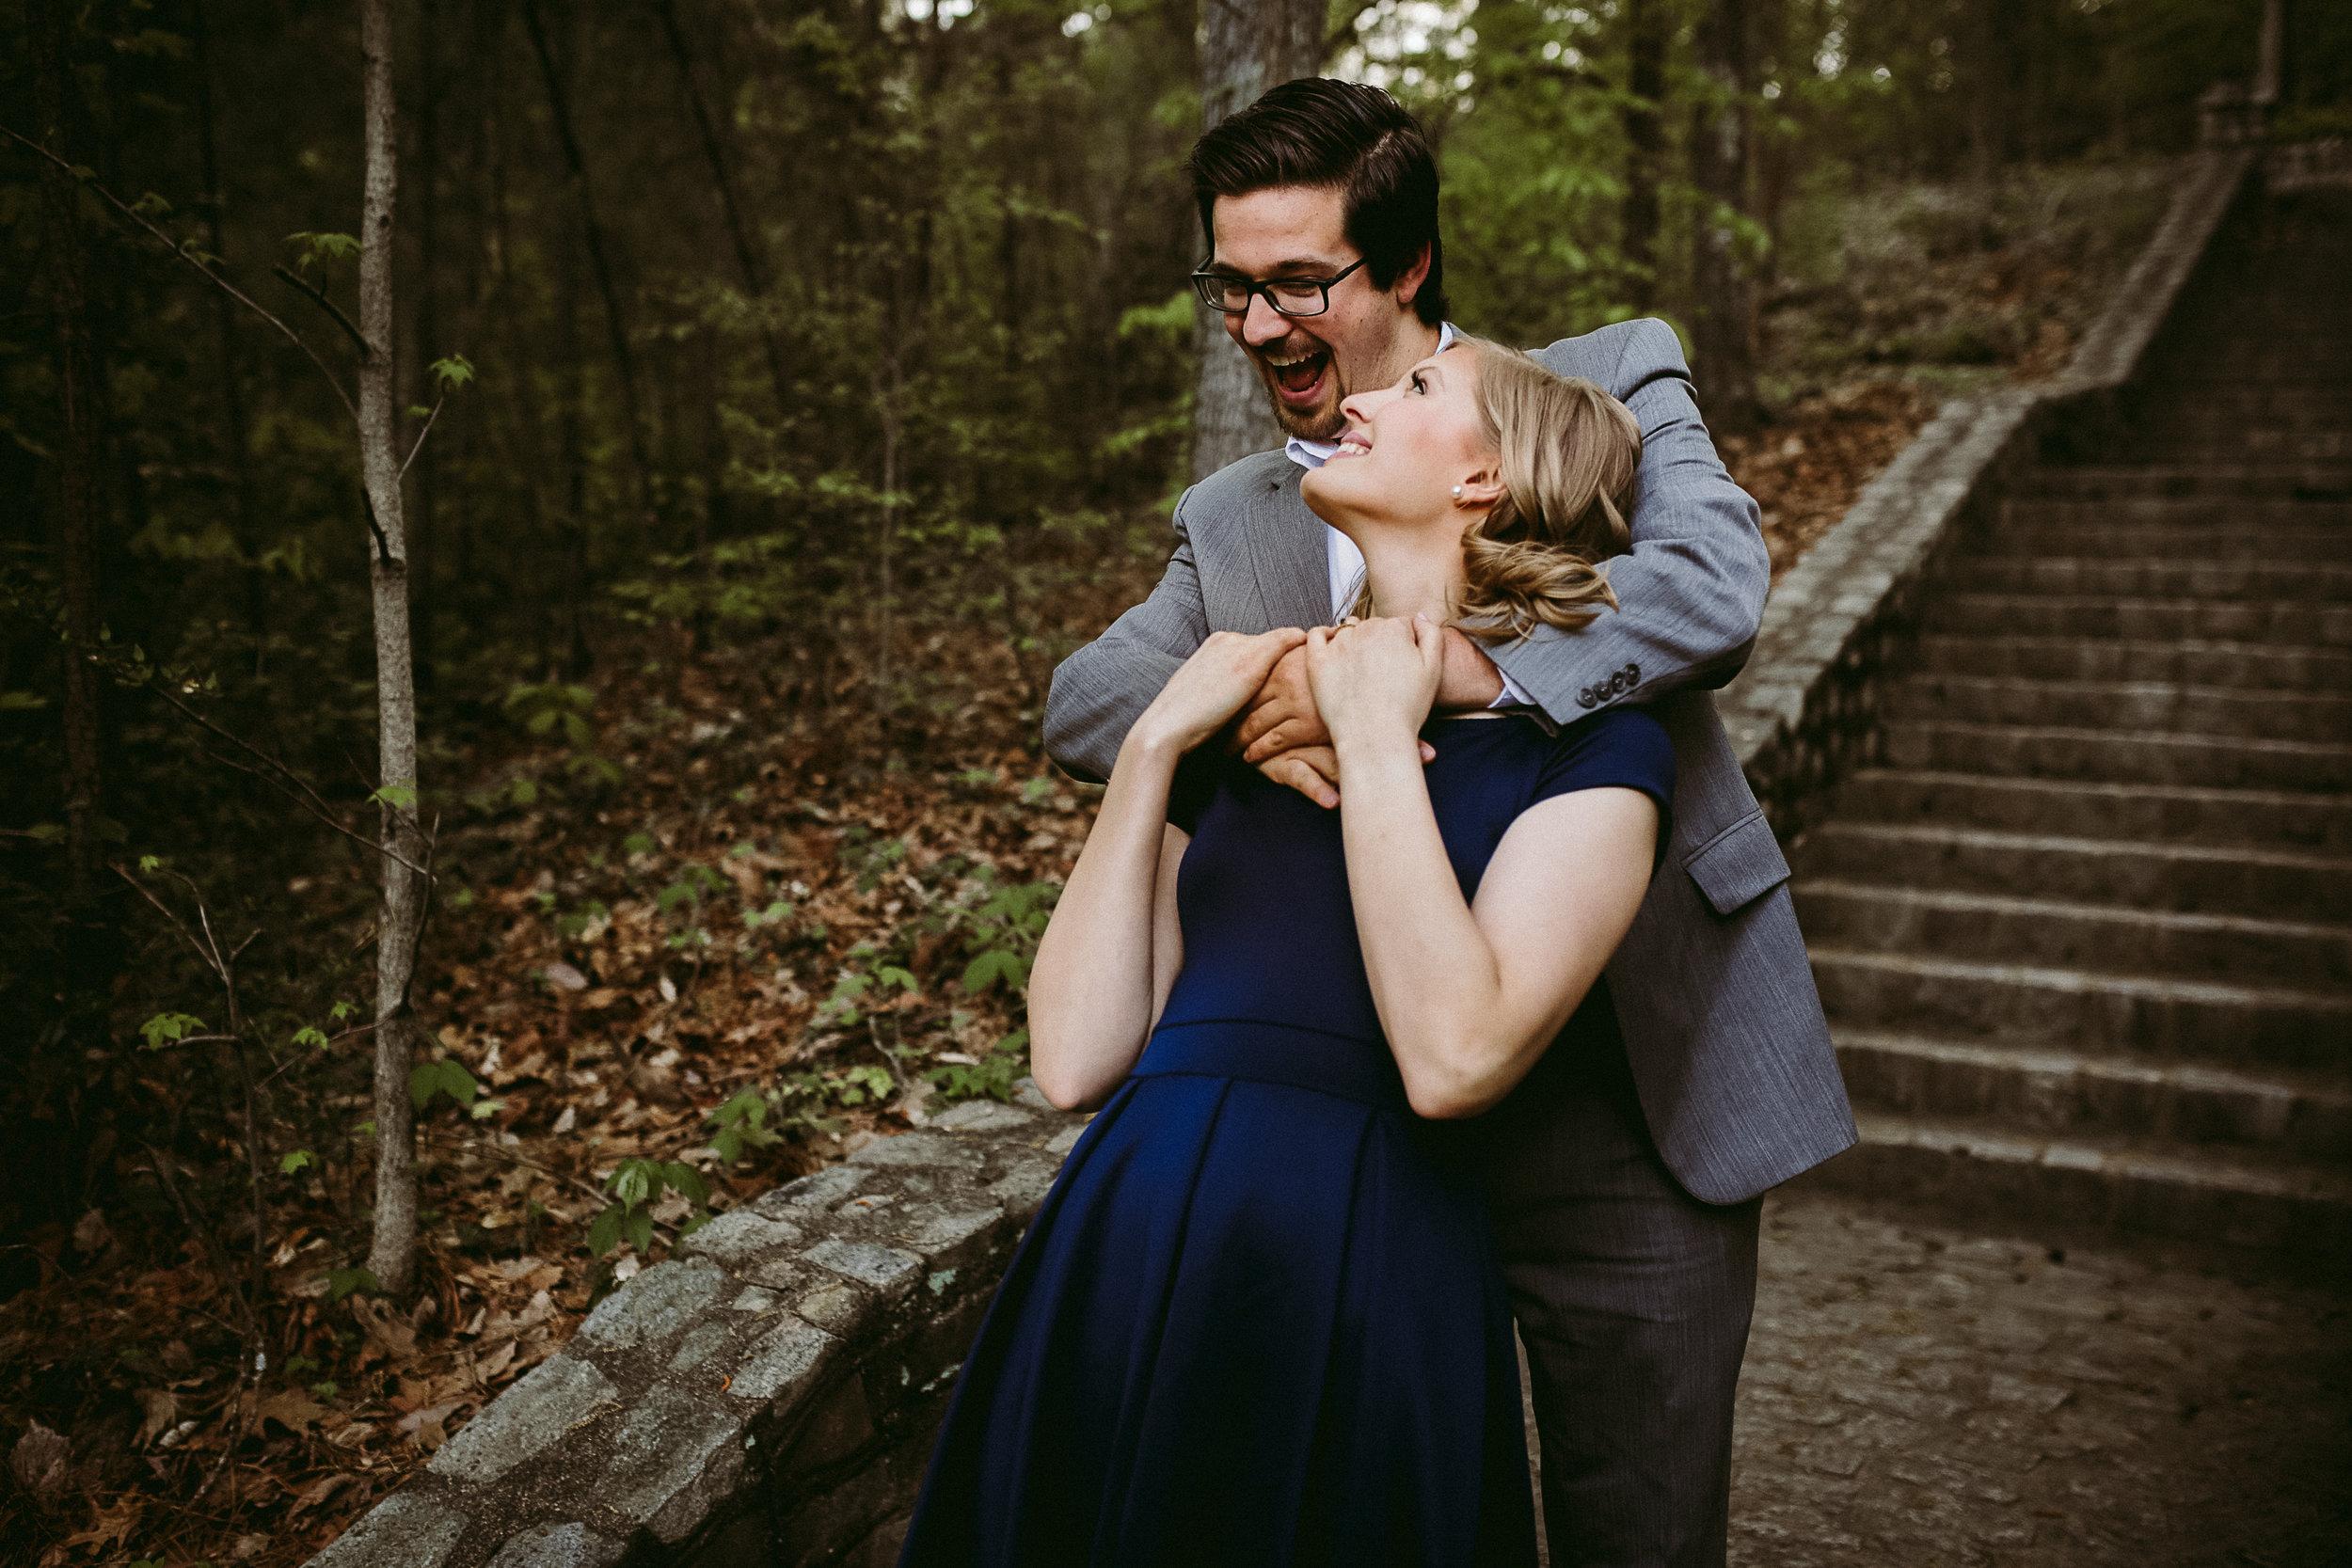 Stephanieandtommyjoe.richmondvirginia.foresthillpark.engagementsession.rebeccaburtphotography-40.jpg